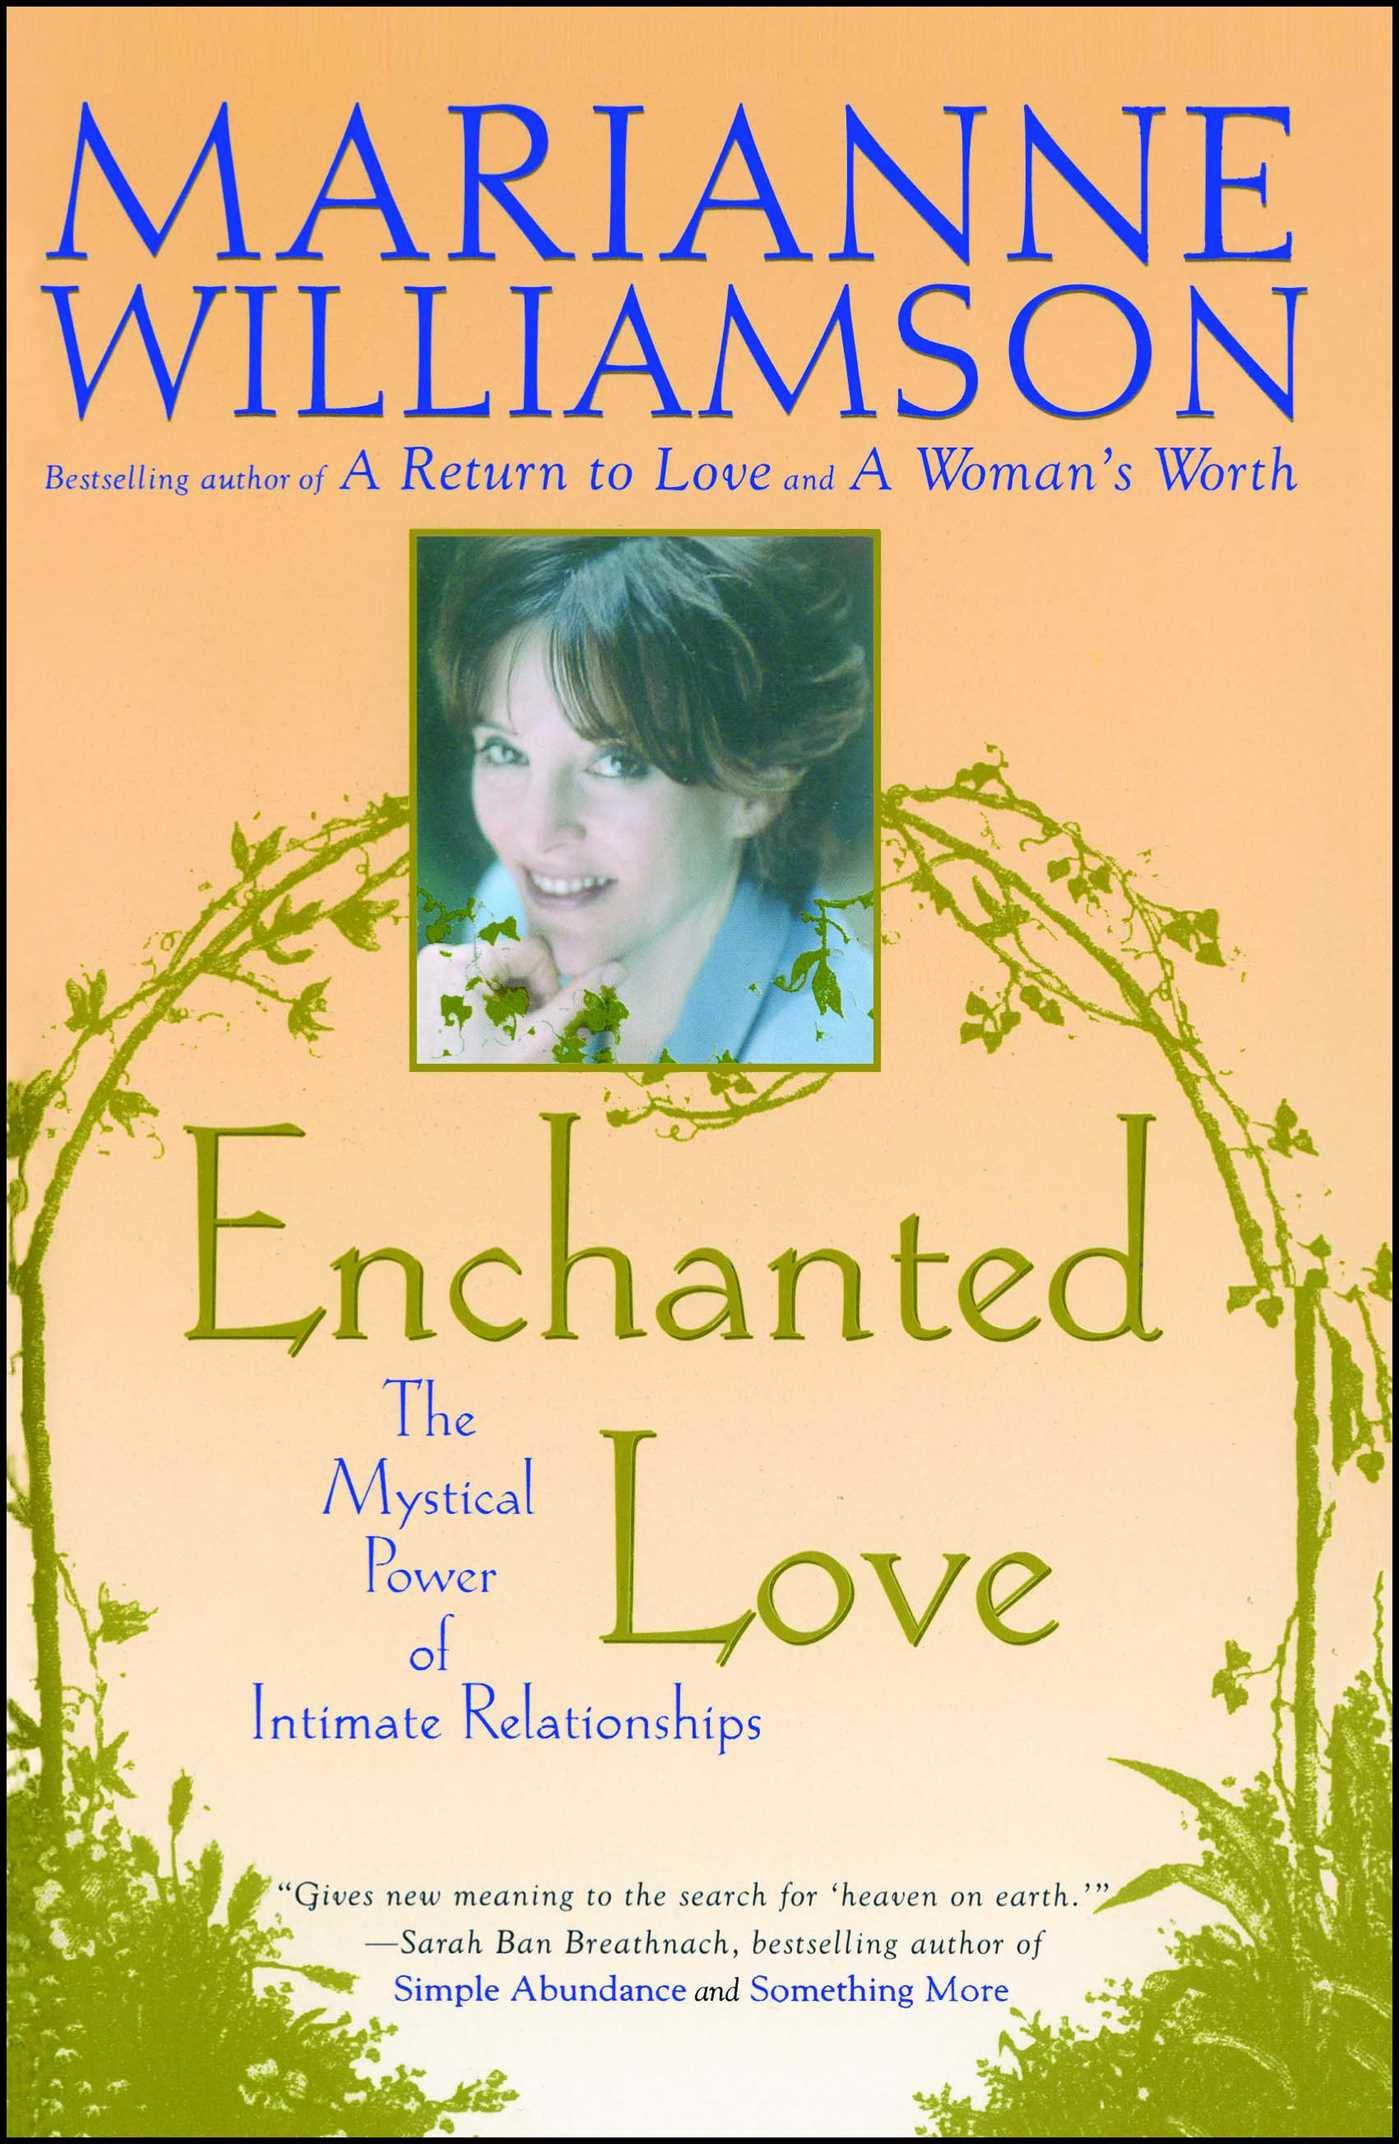 enchanted love 2.jpg